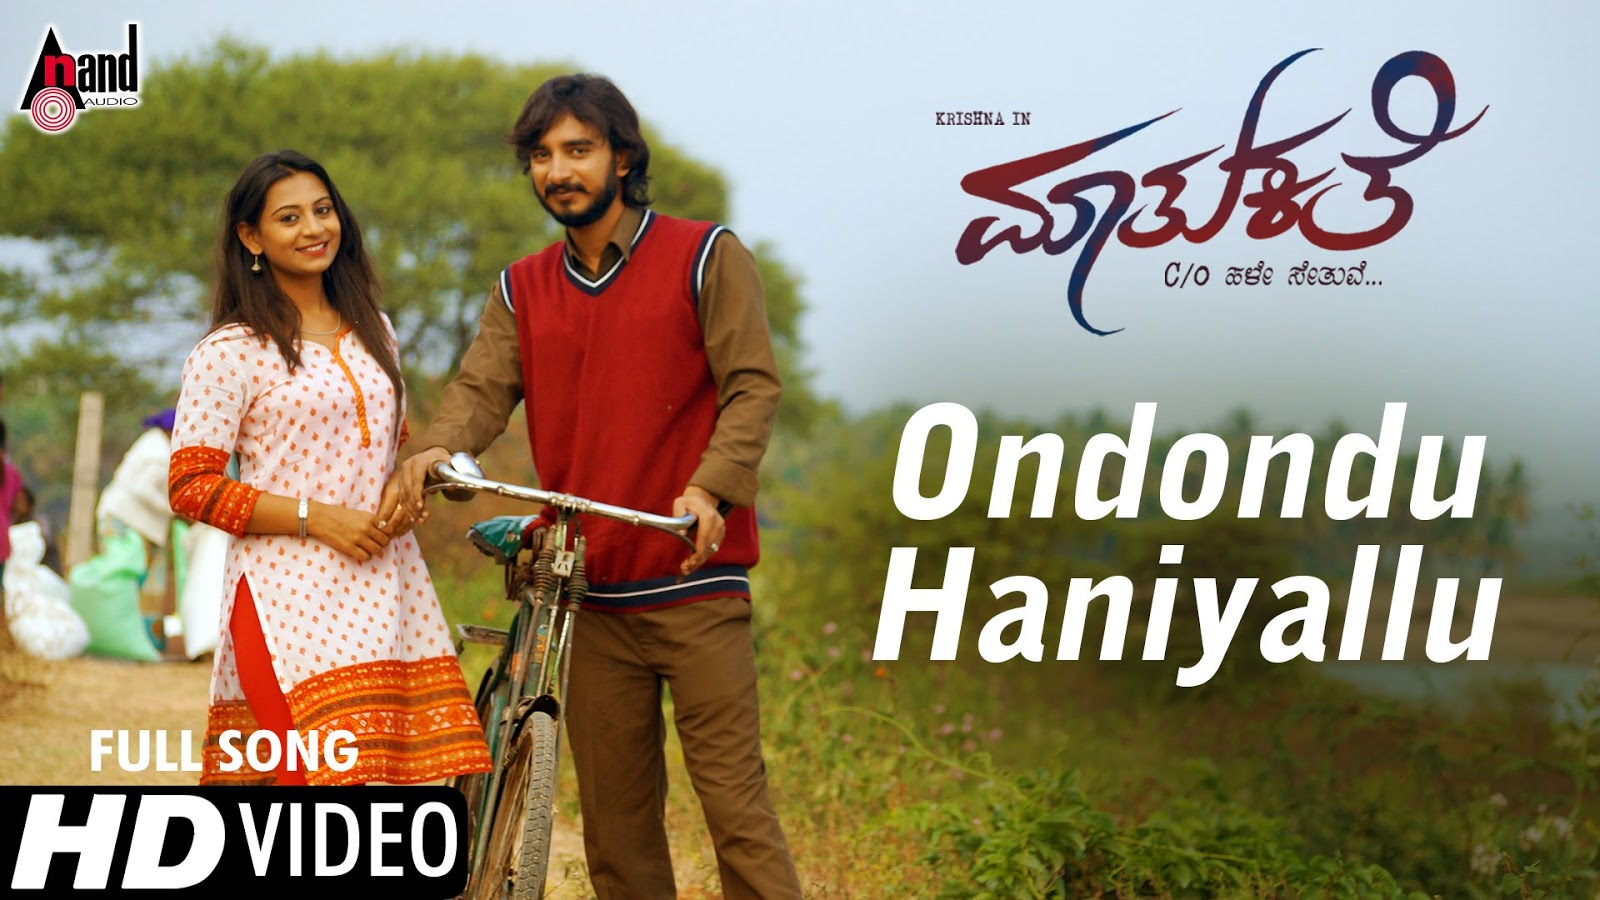 Maathukathe Kannada Ondondu Haniyallu Video Song Download